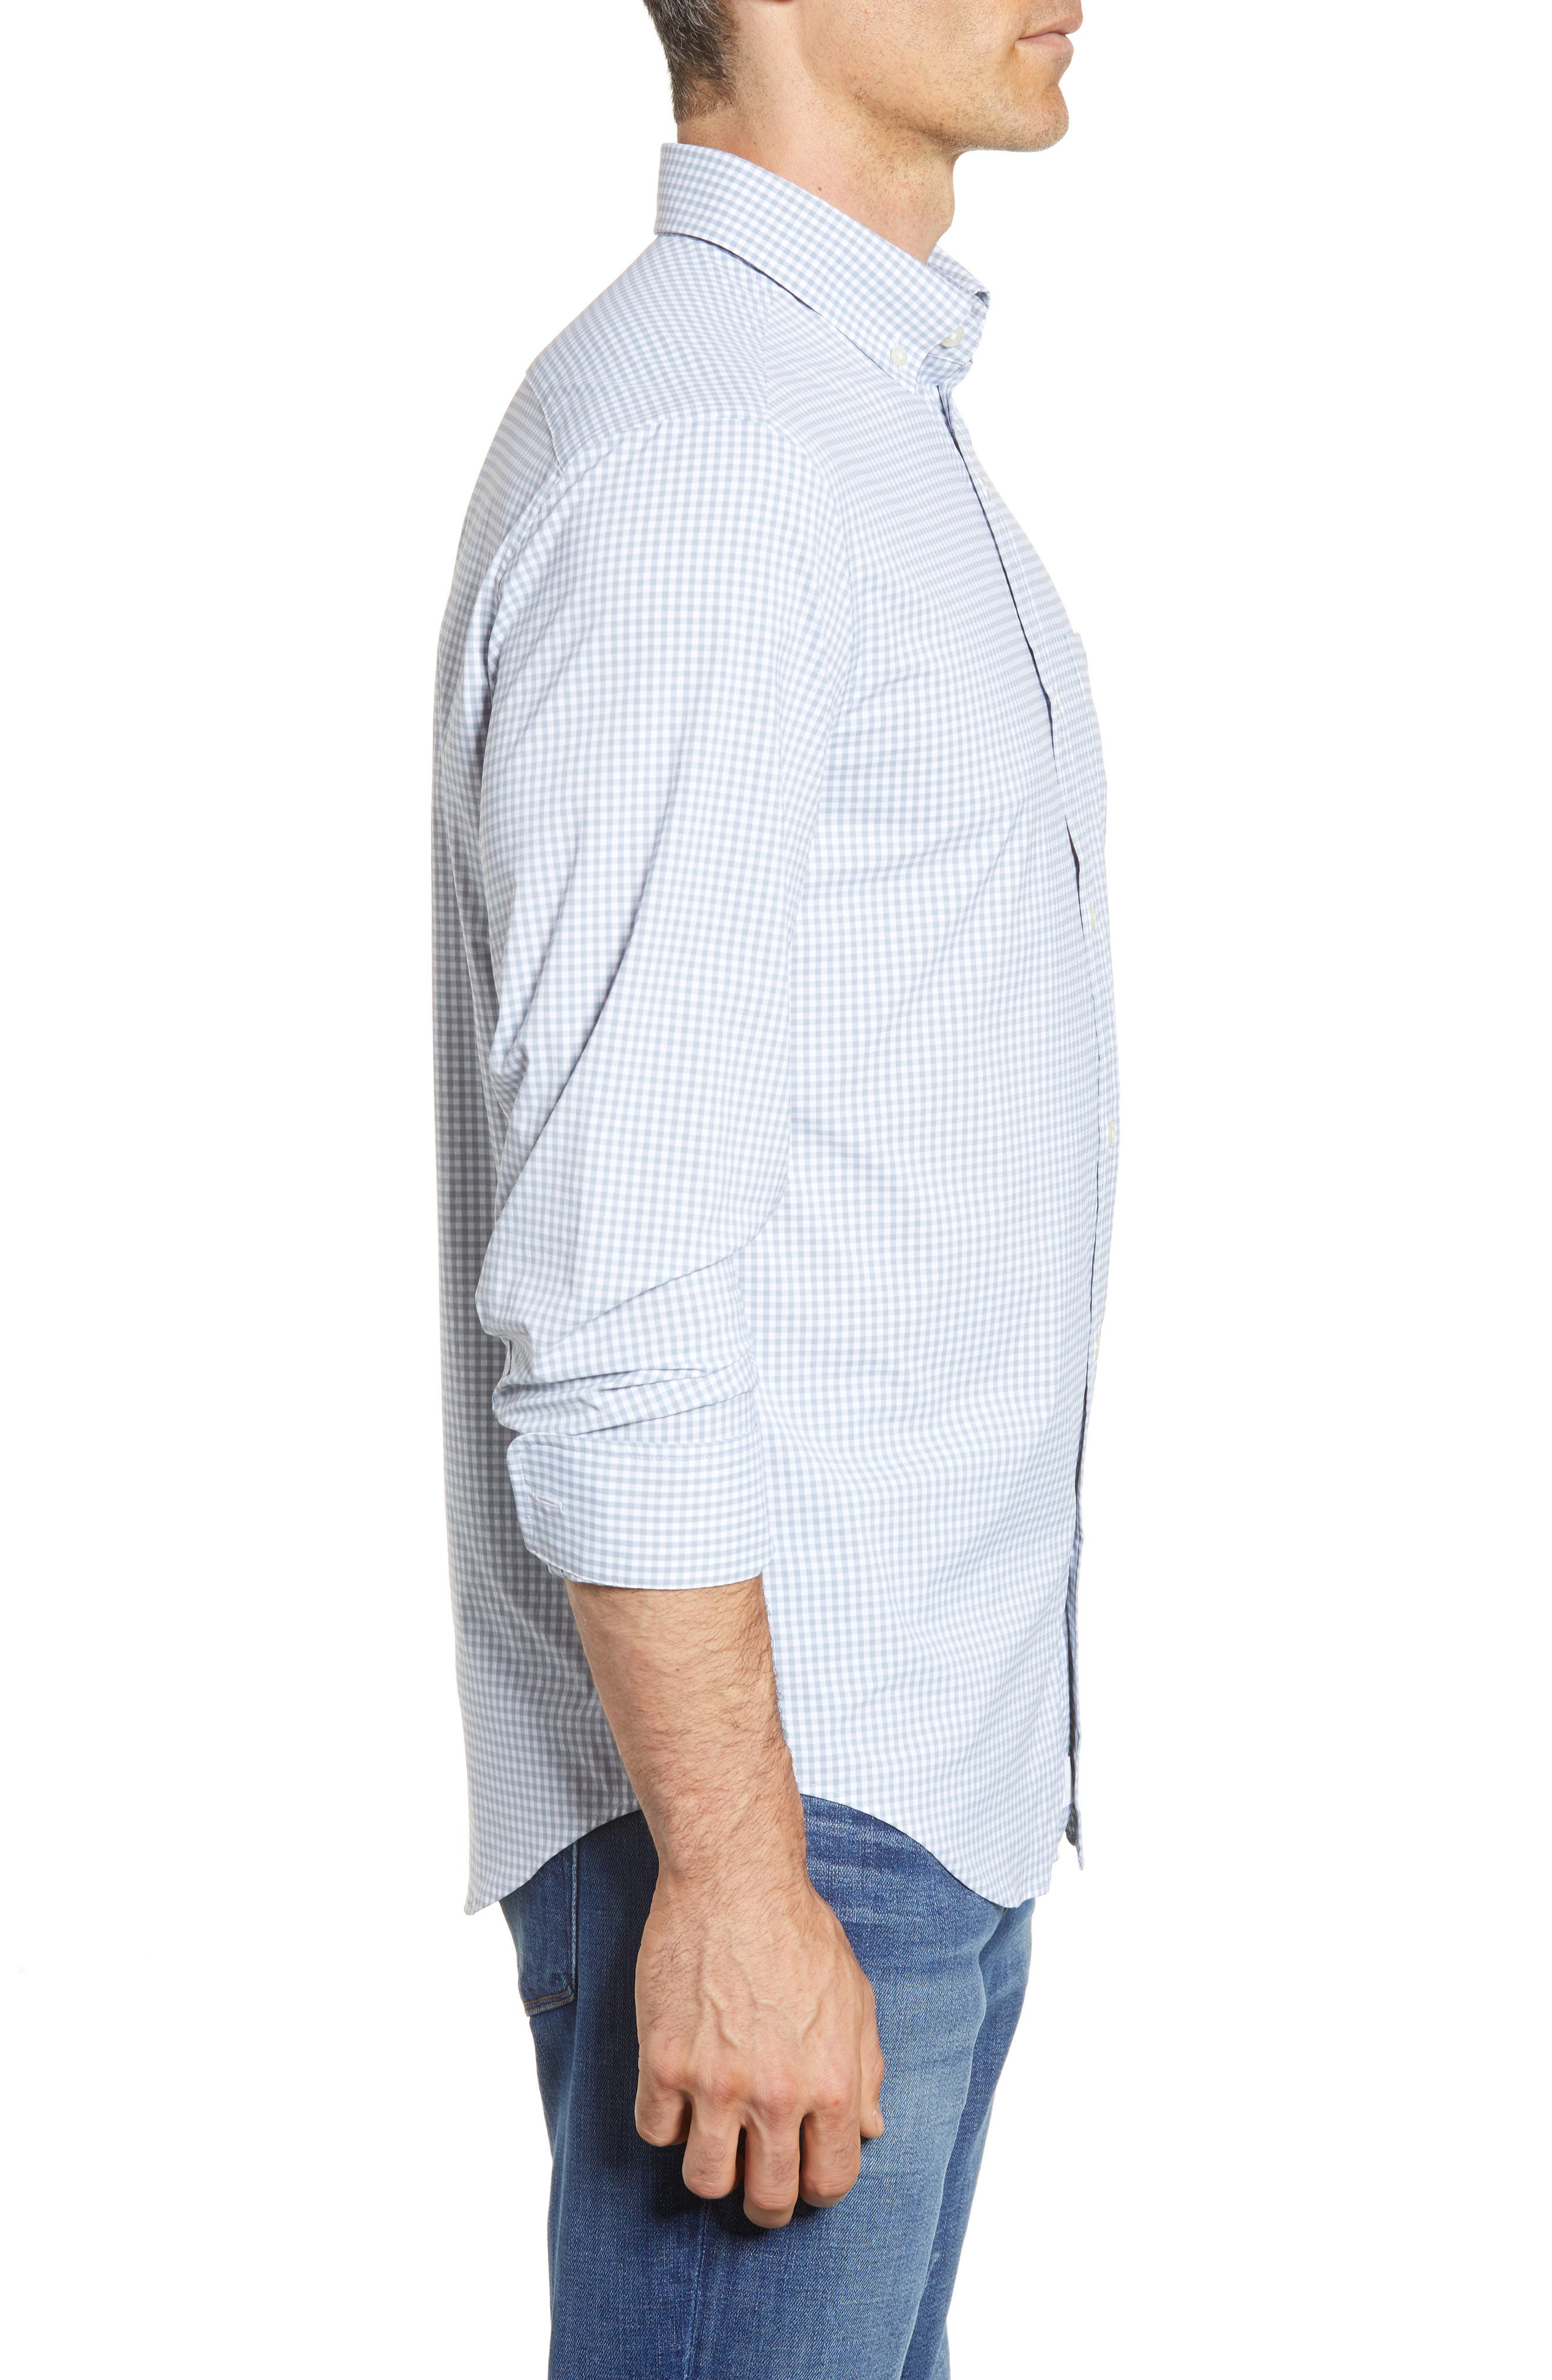 VINEYARD VINES,                             Grand Cay Tucker Regular Fit Gingham Performance Sport Shirt,                             Alternate thumbnail 3, color,                             023